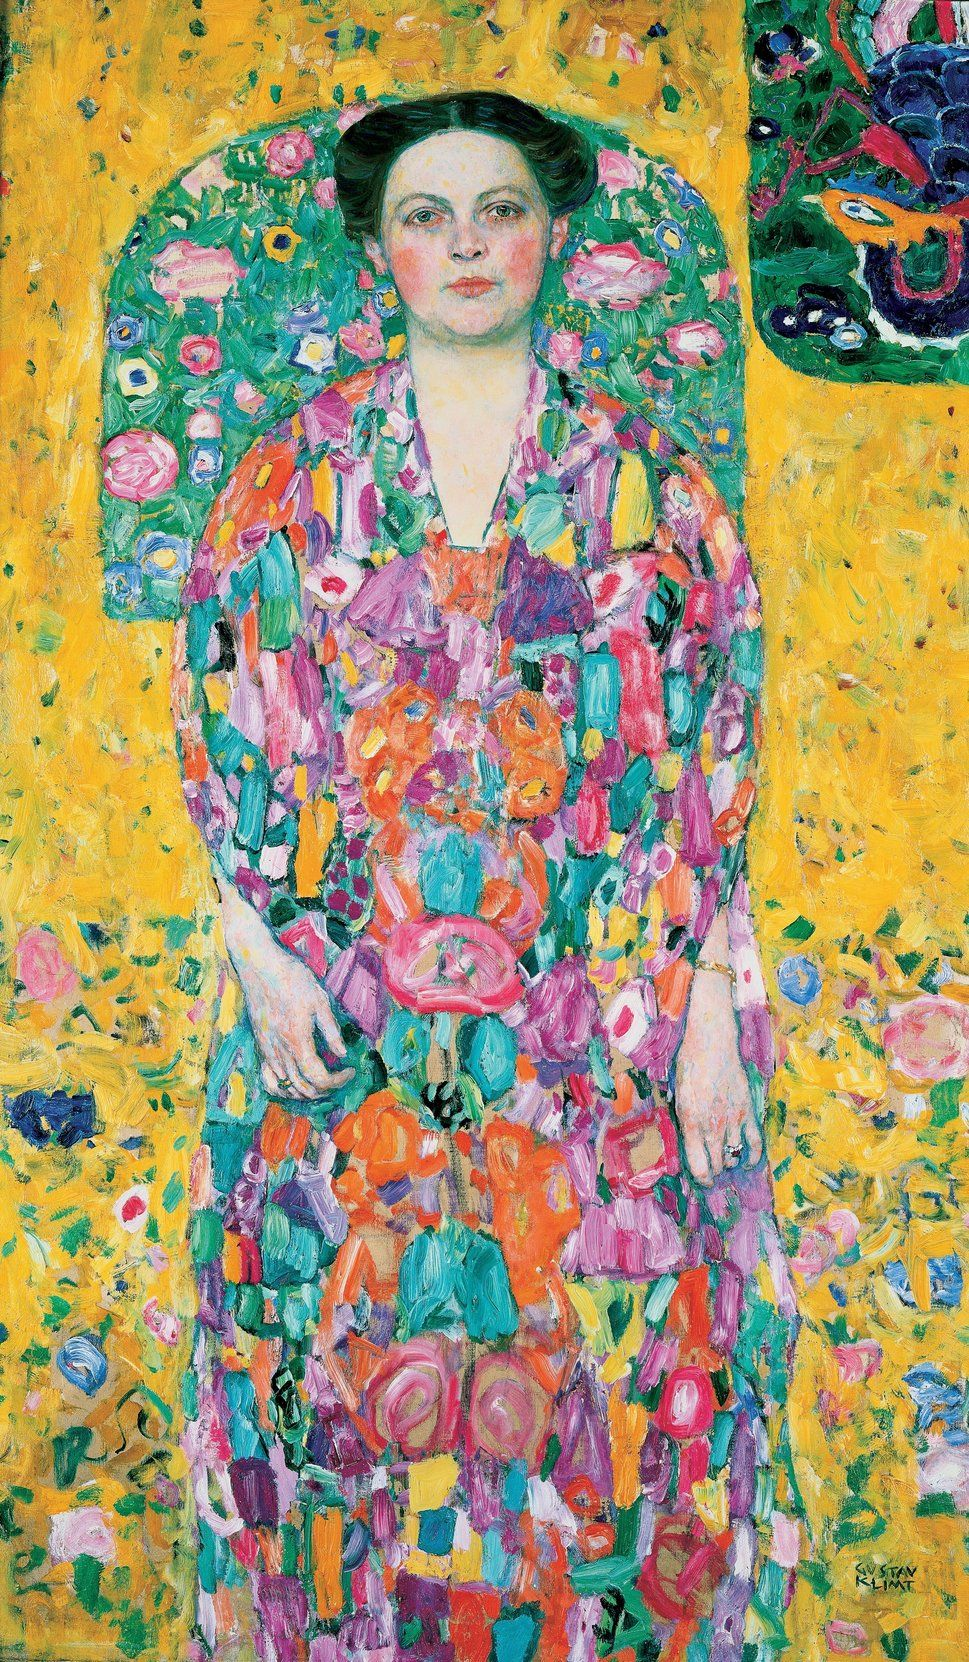 The Story Behind Gustav Klimt S Portrait Of An Independent 9 Year Old Girl Klimt Art Gustav Klimt Art Klimt